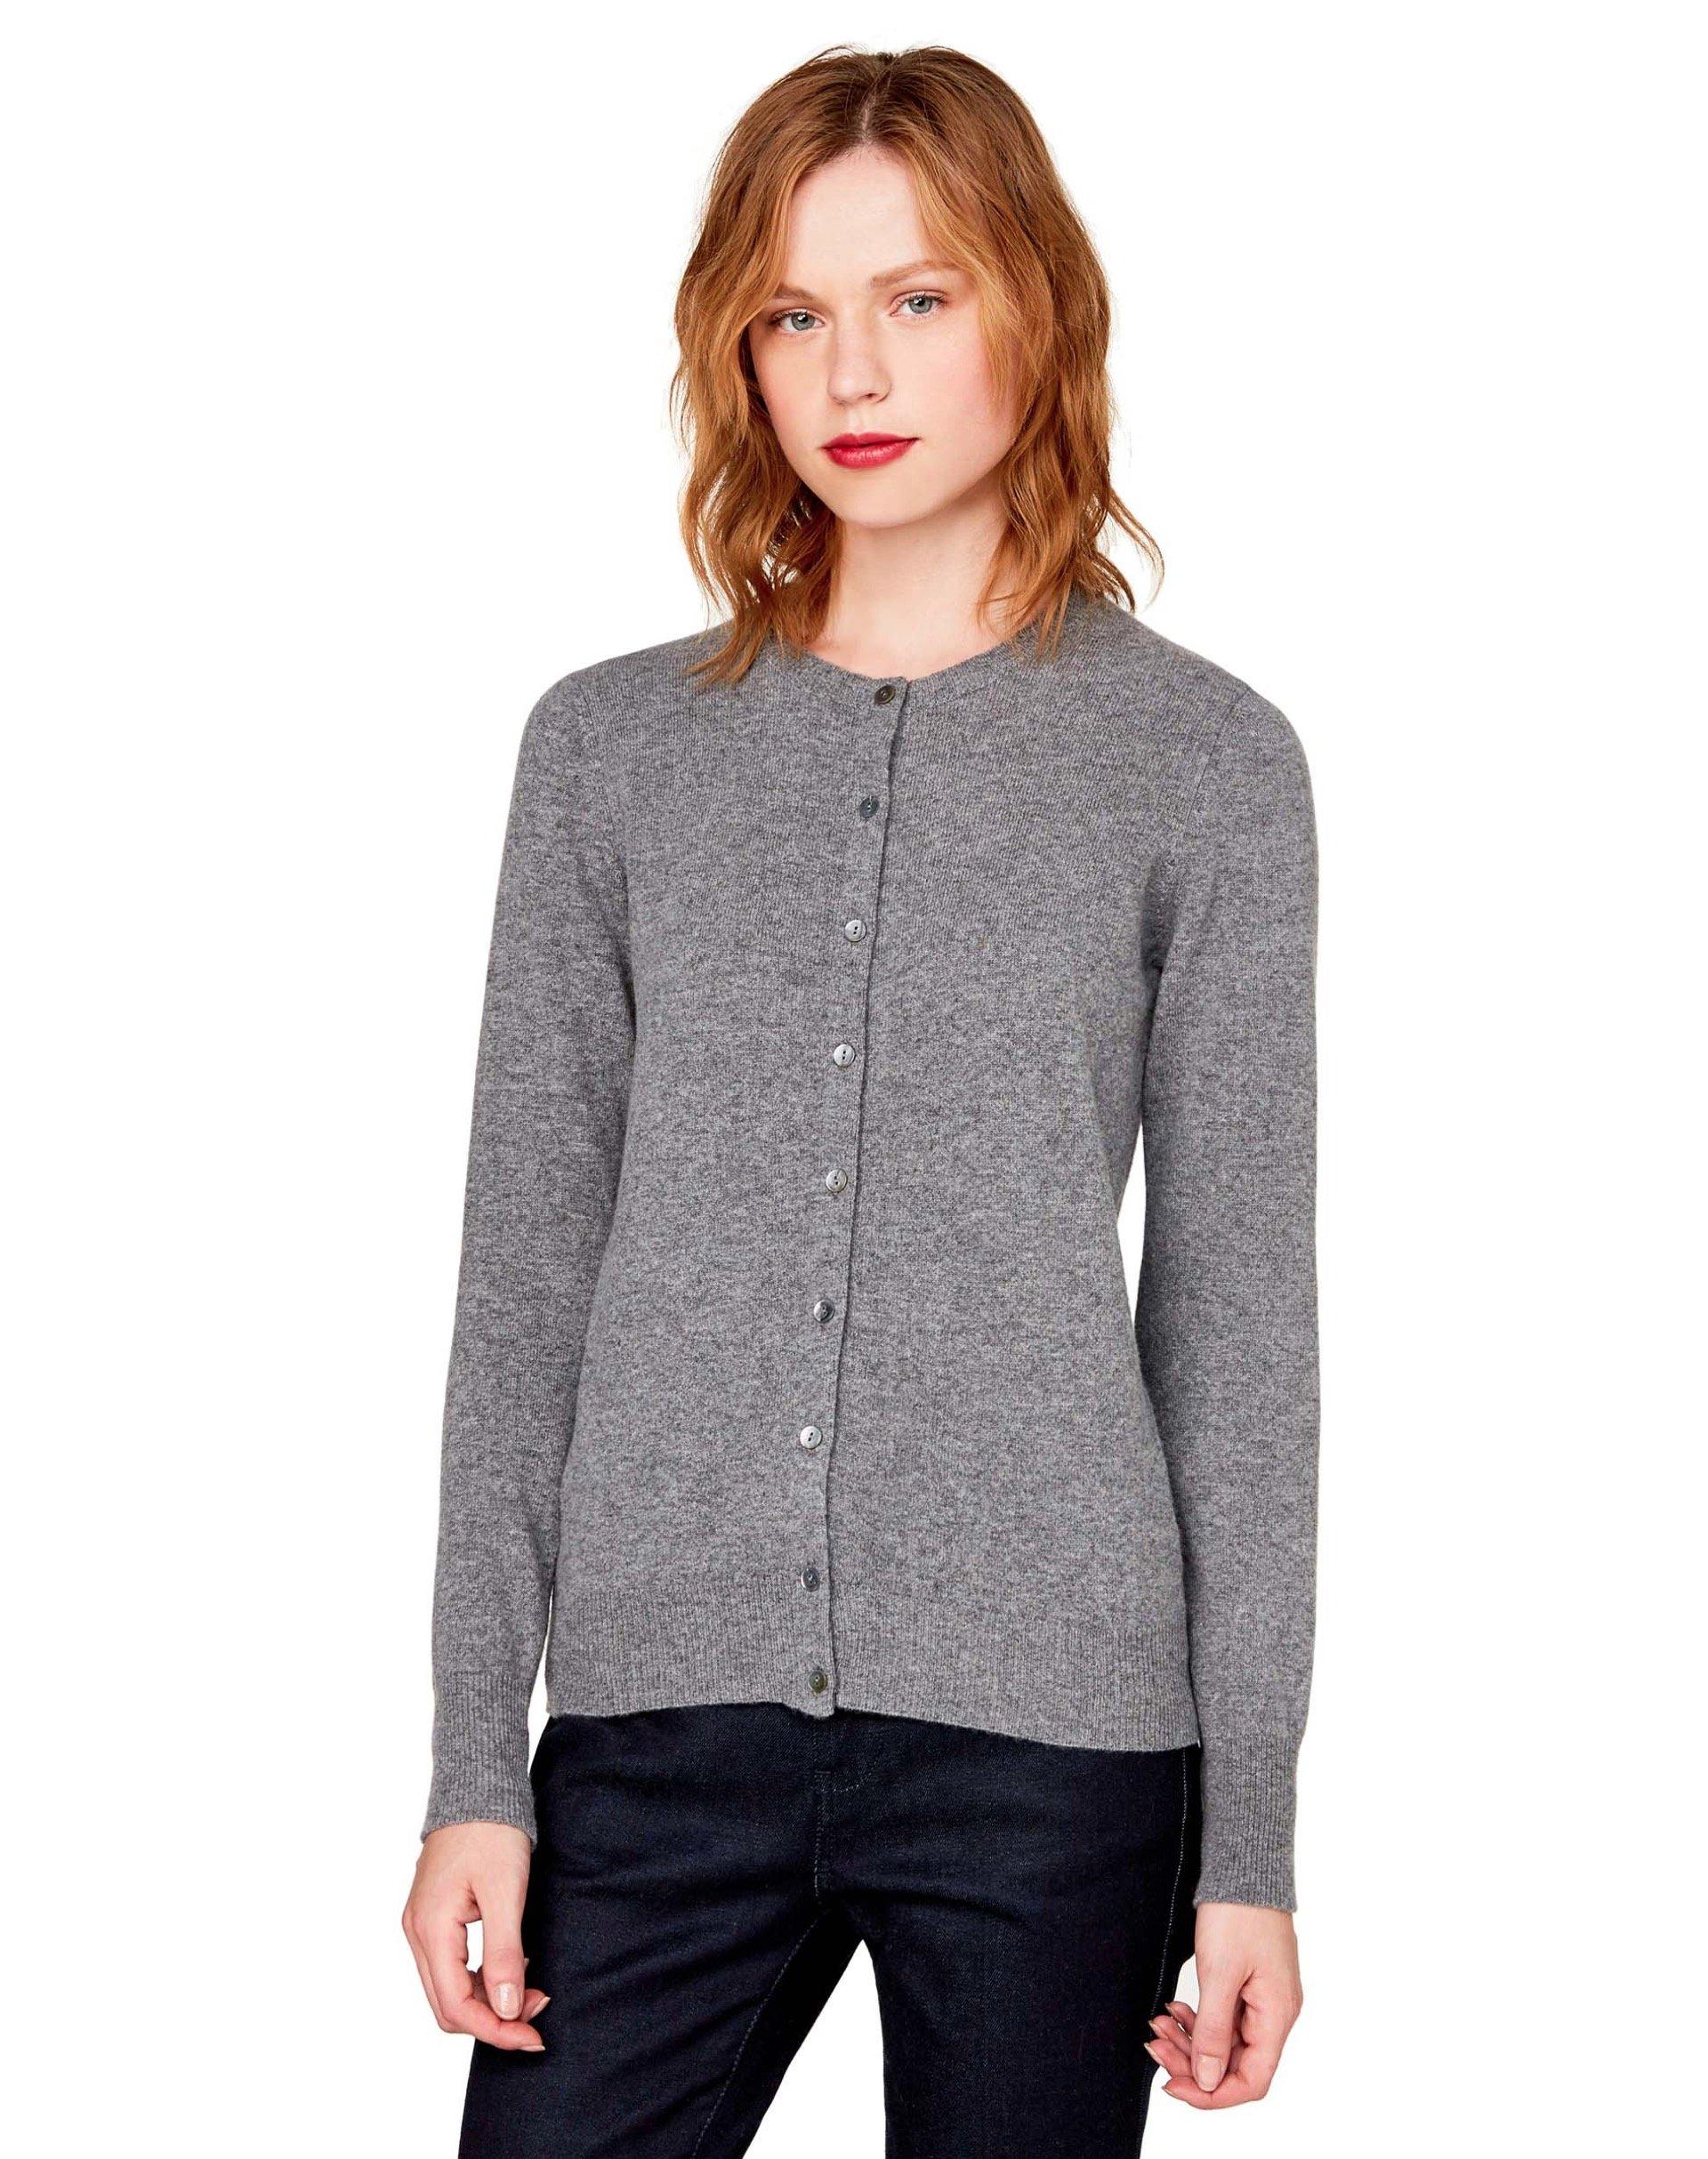 КардиганКардиганы<br>Кардиган с длинным рукавом из 100% шерсти.<br>Цвет: Серый; Размер: XL;